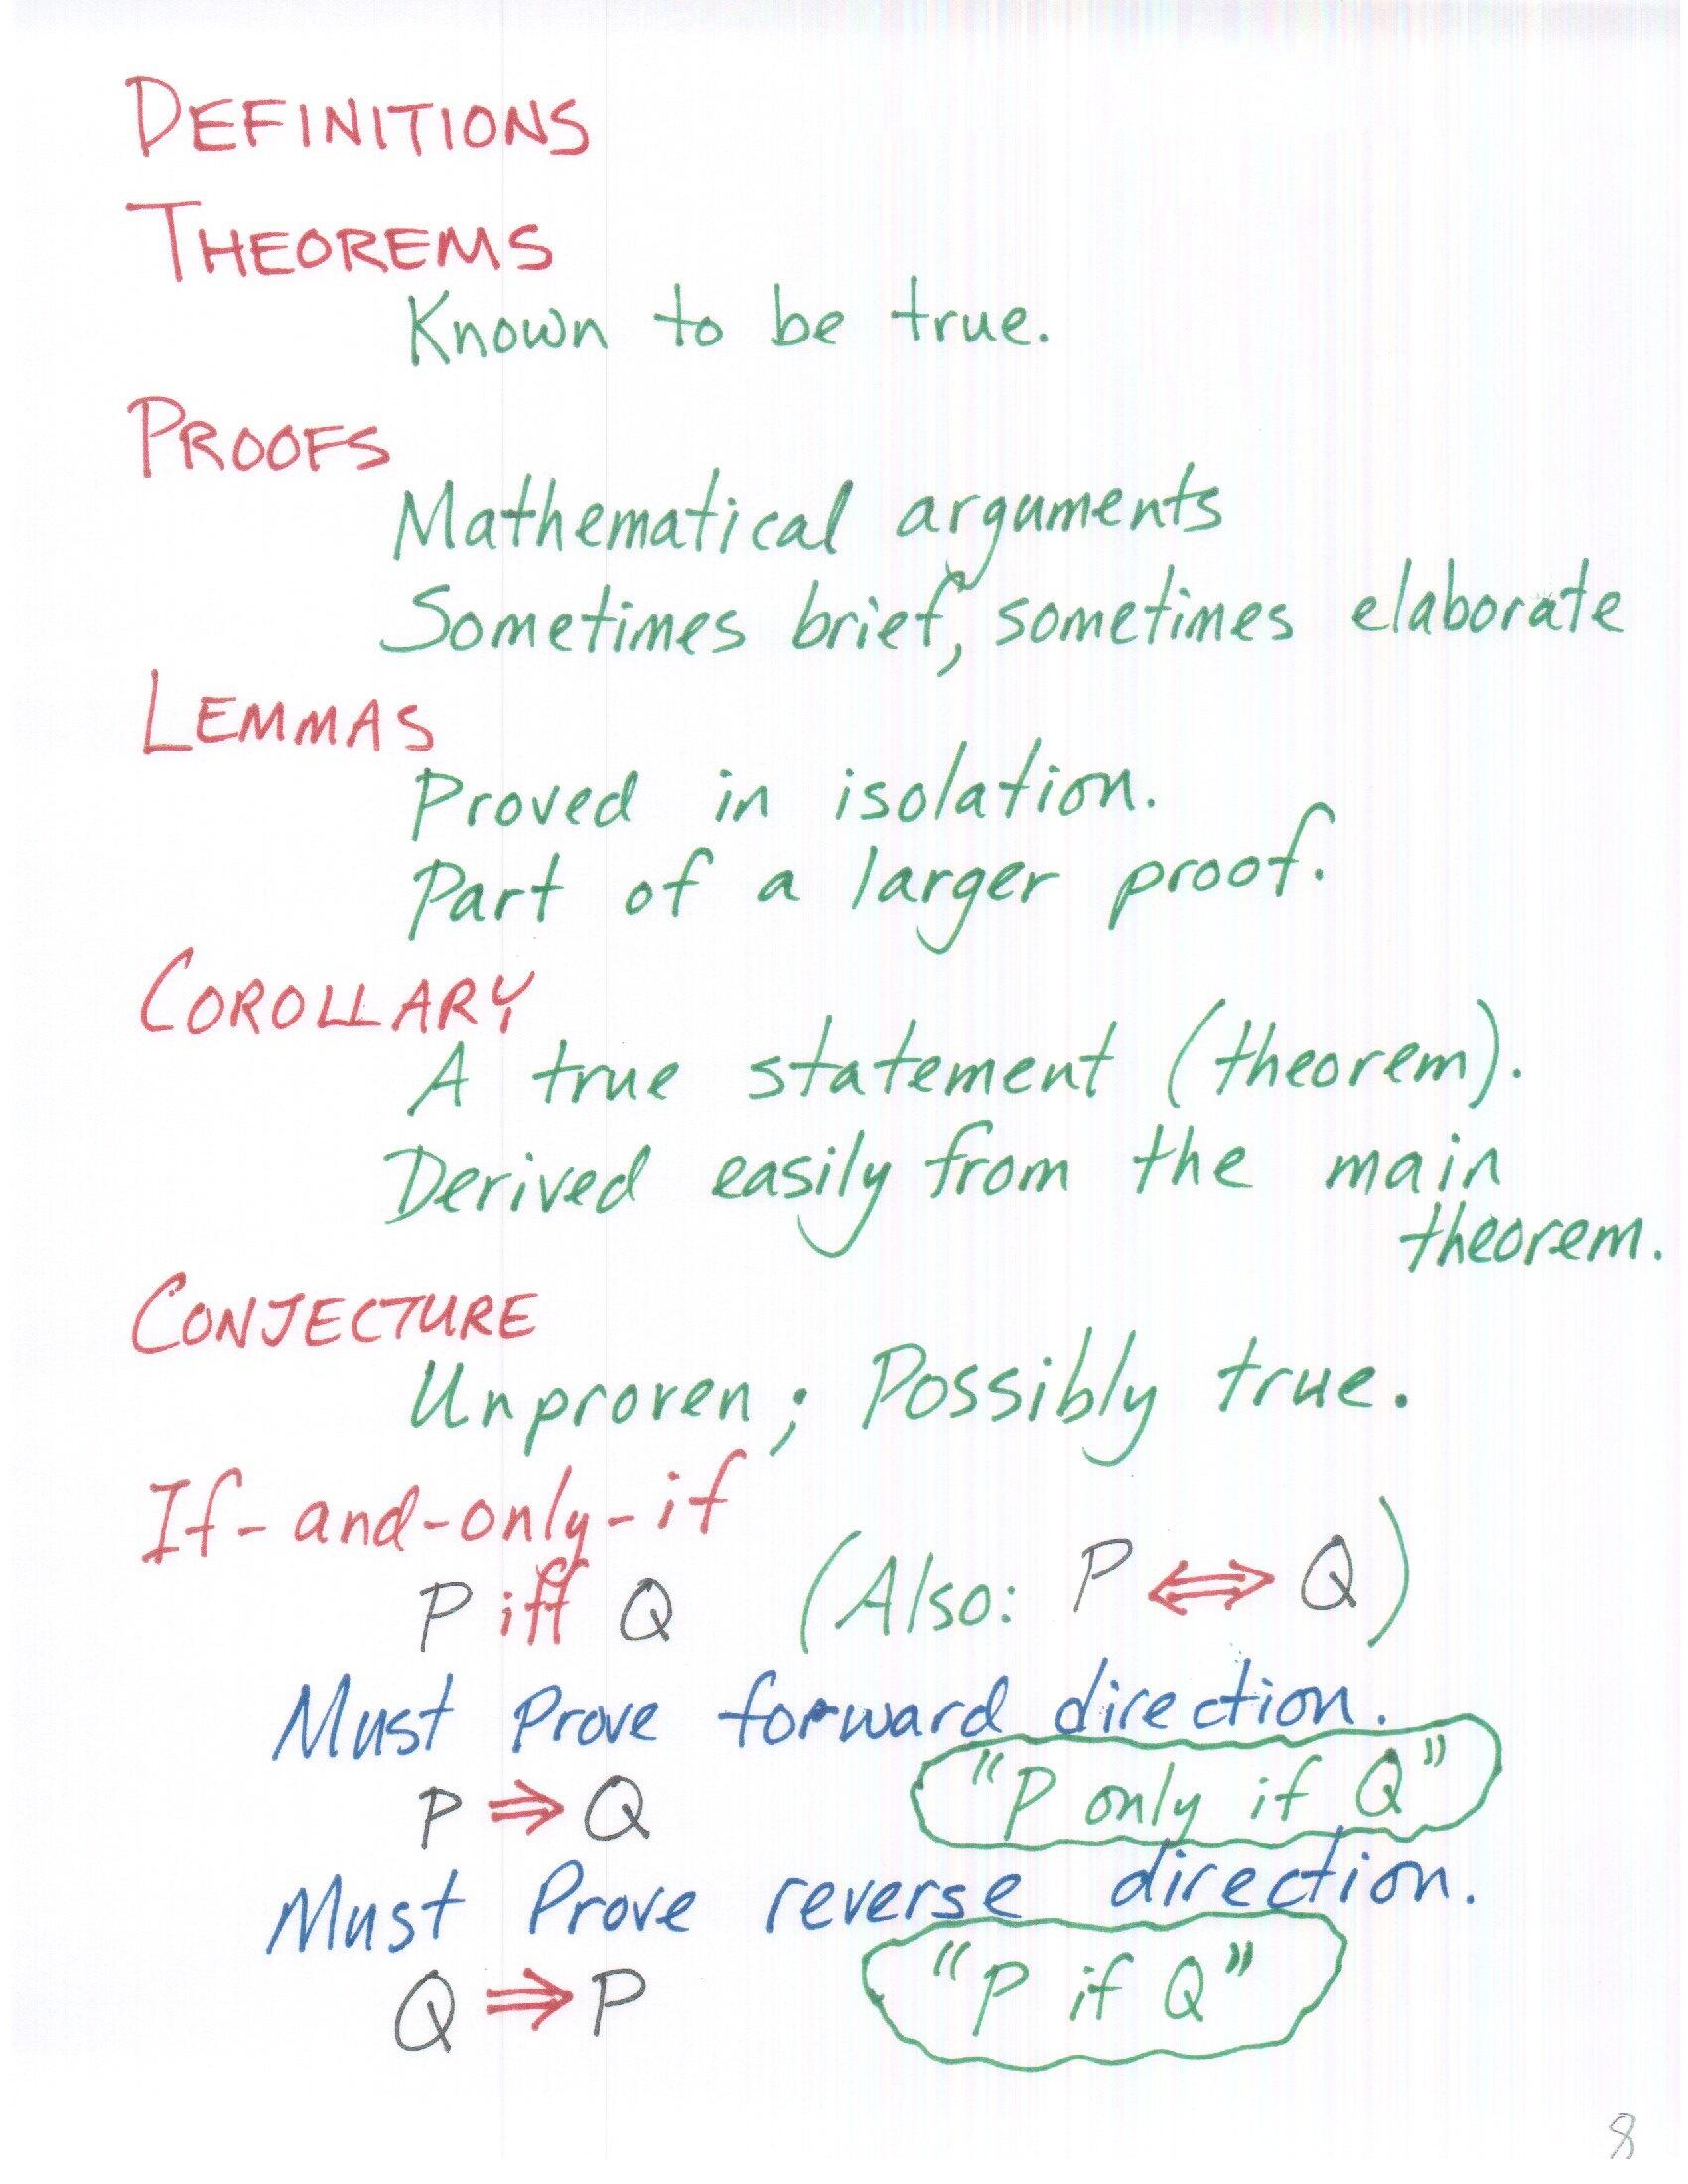 http://web.cecs.pdx.edu/~harry/TheoryOfComp/slides/chapter0/slide%207.jpeg